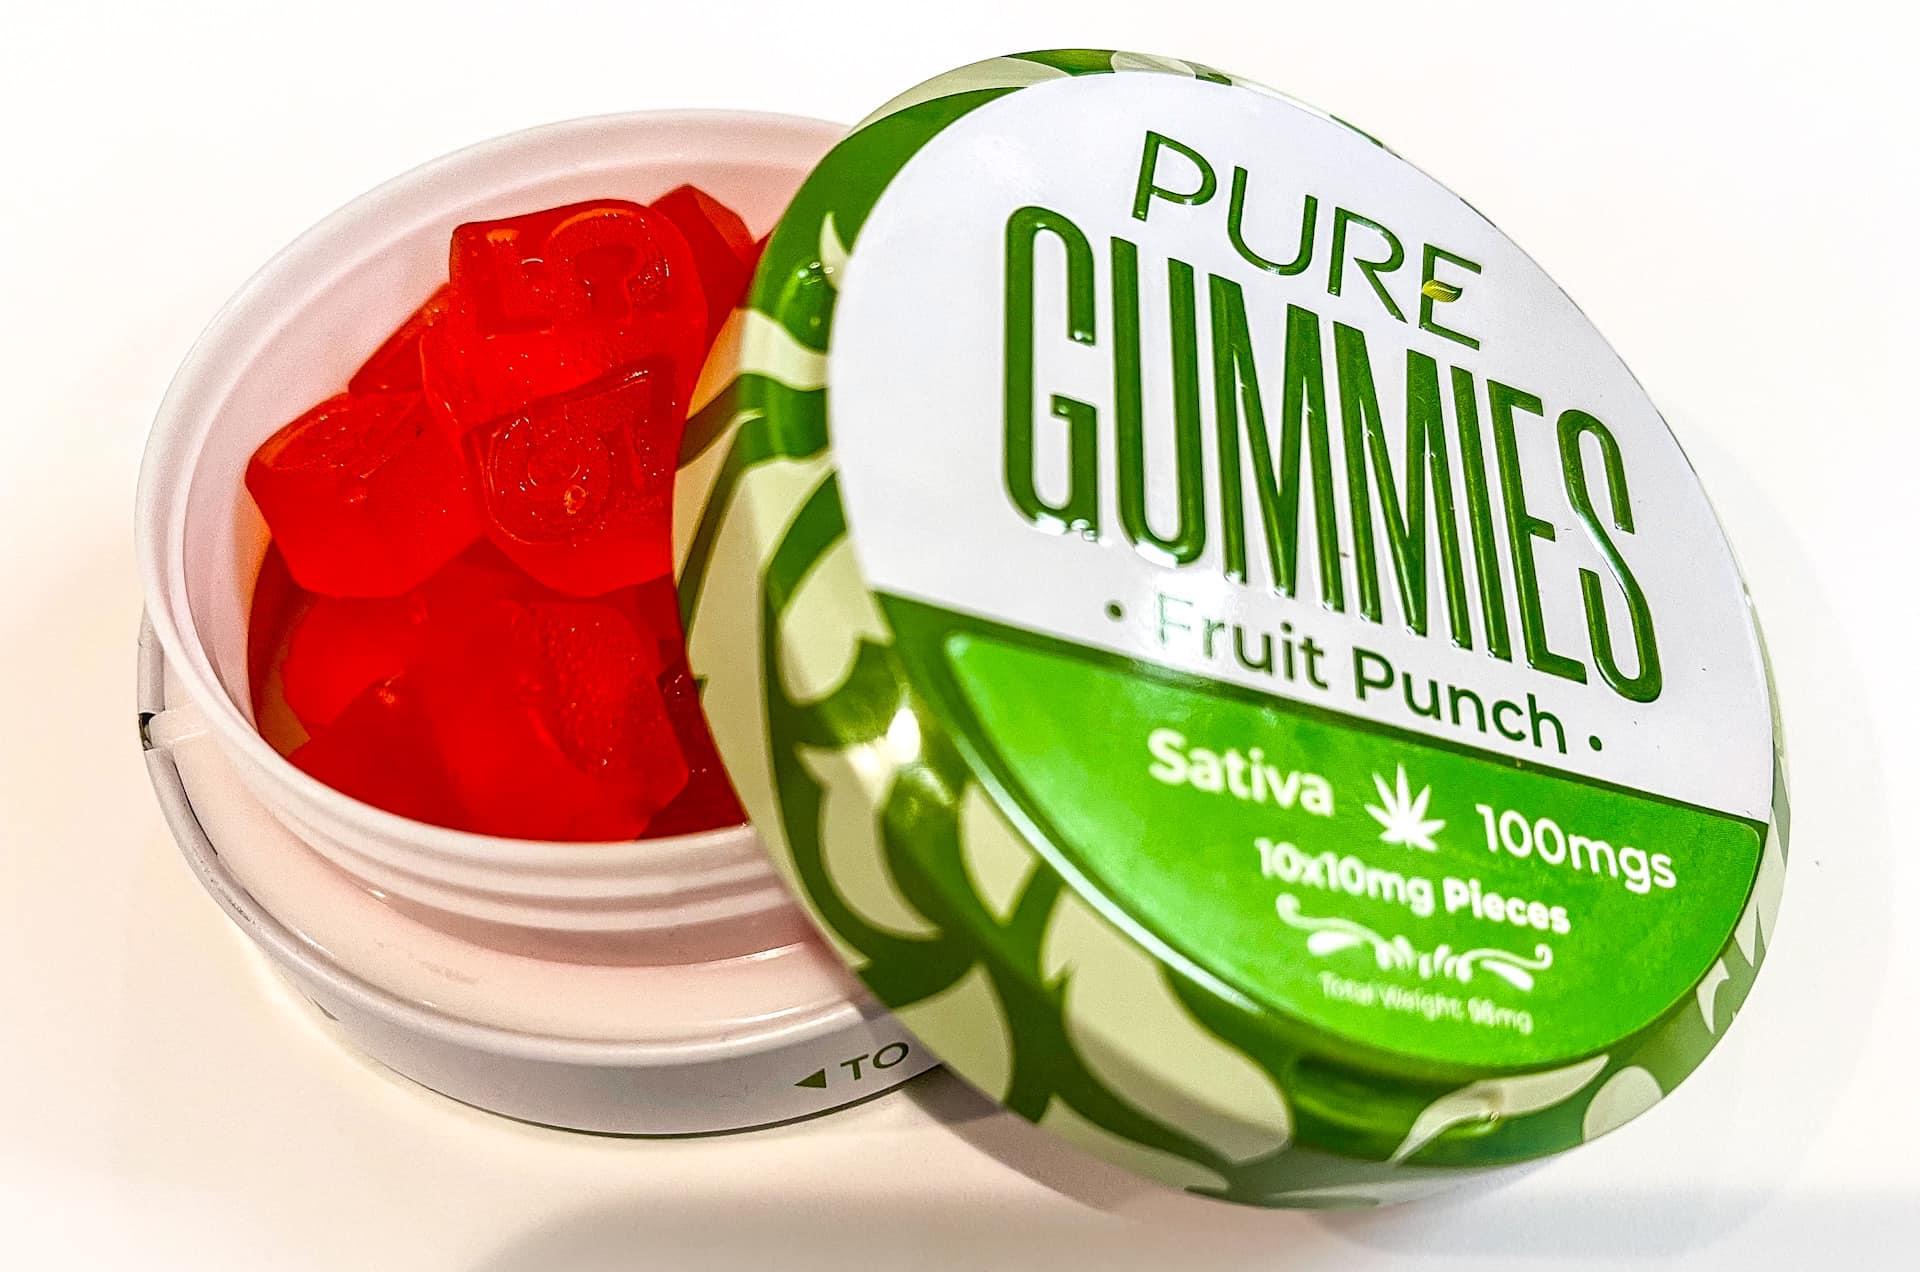 PURE Fruit Punch edible gummies Arizona